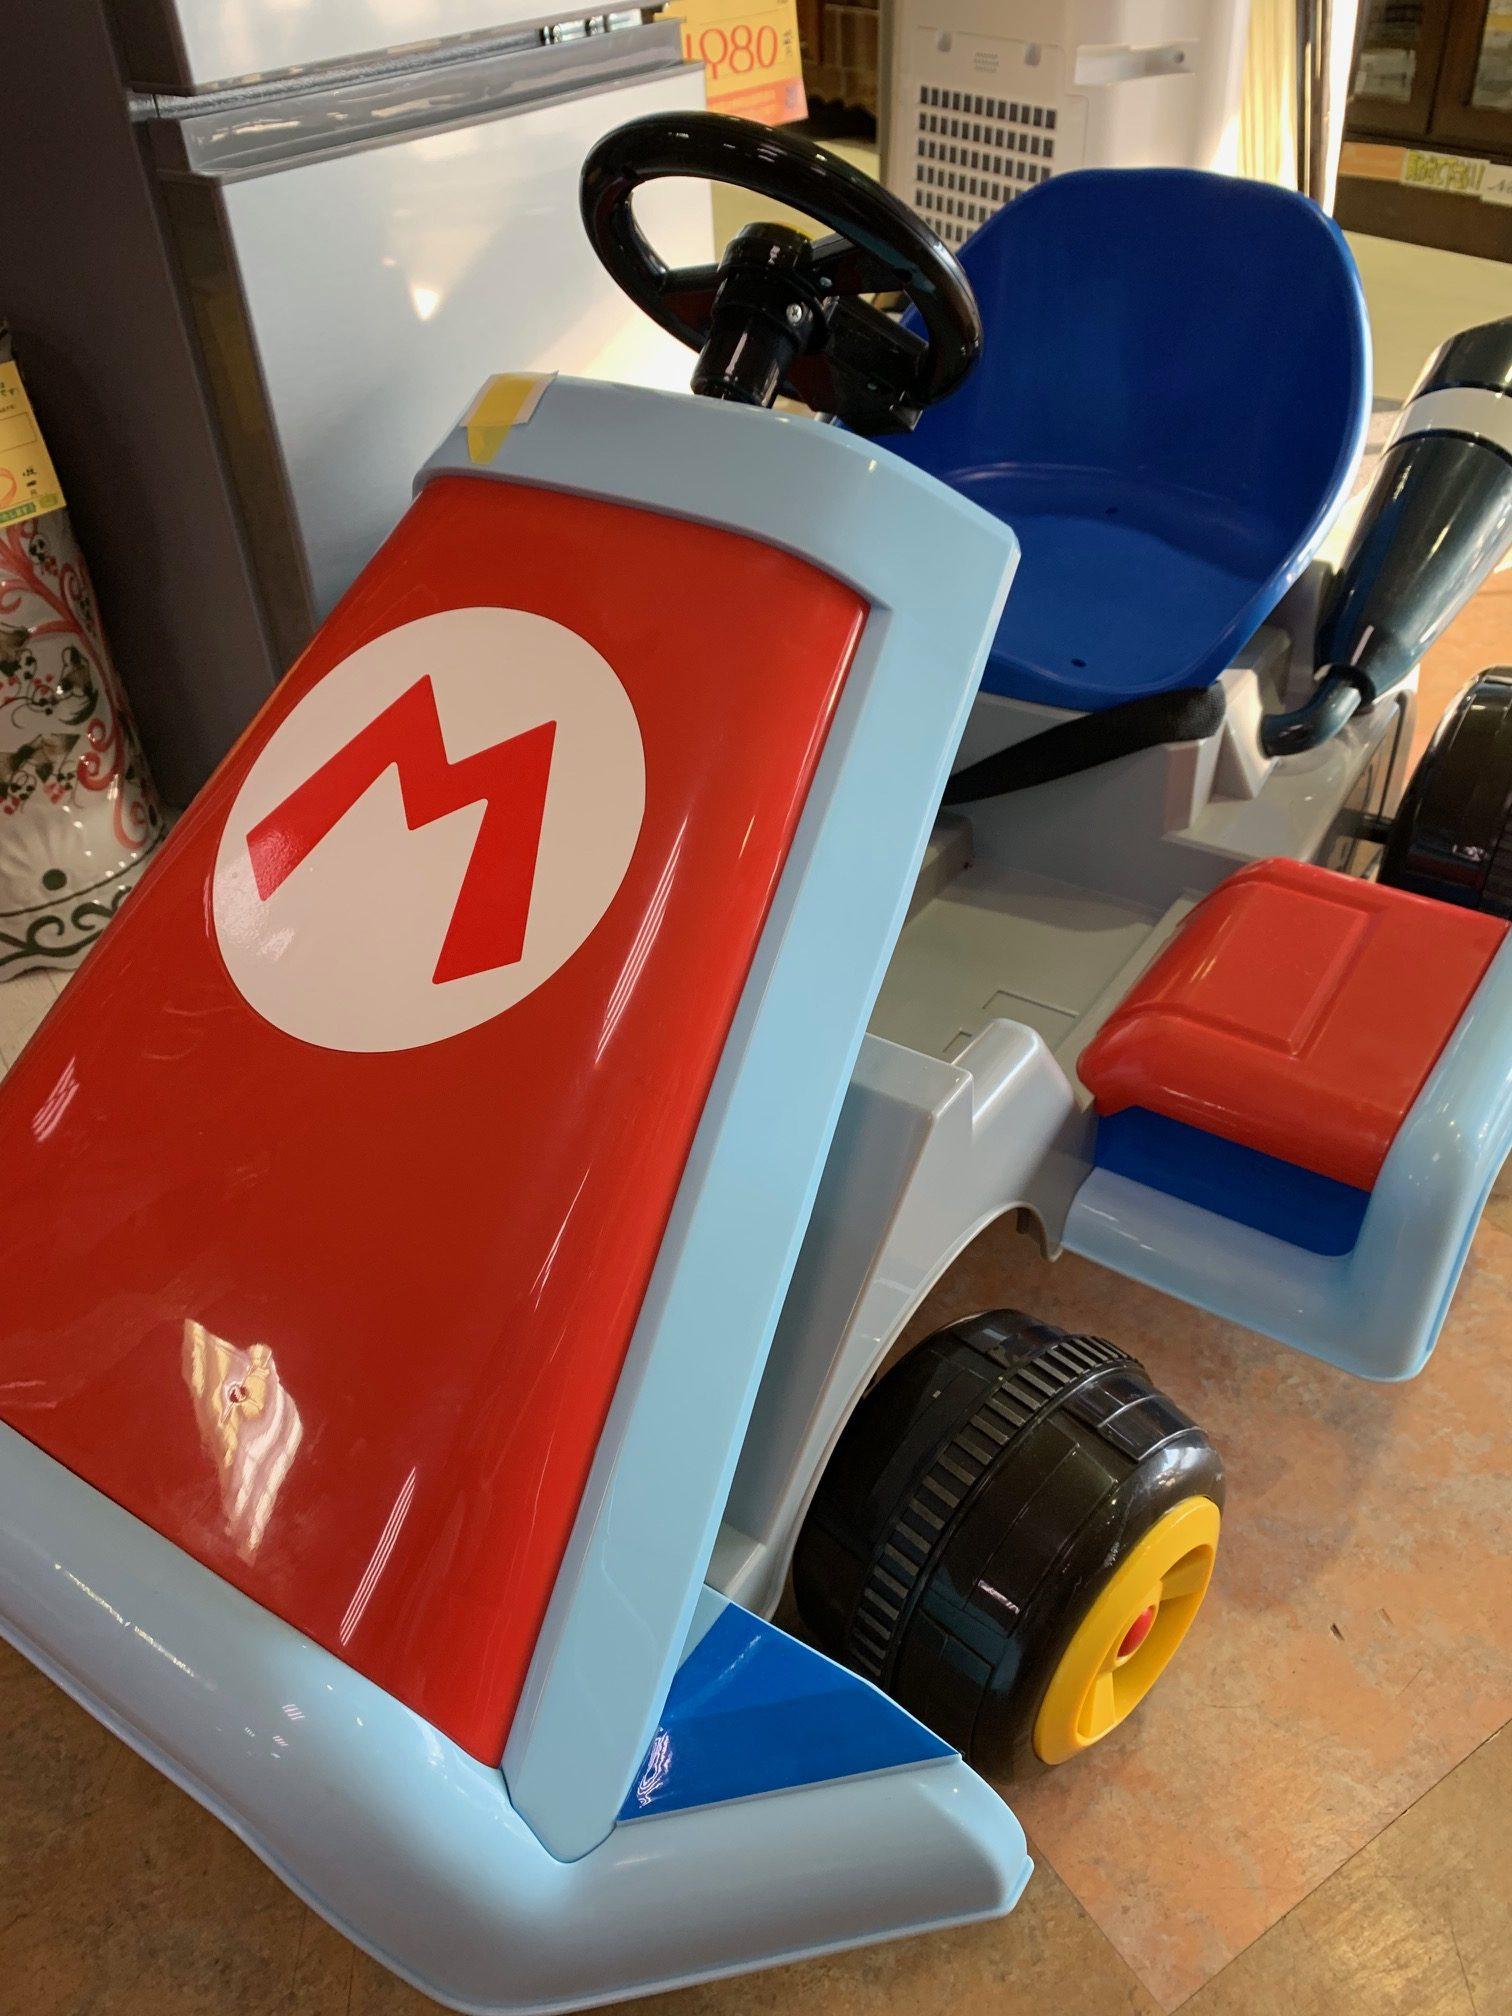 Nintendo マリオカート 電動カー キッズ☆サンステッププラスワッセ店 買取 買い取り 福井市